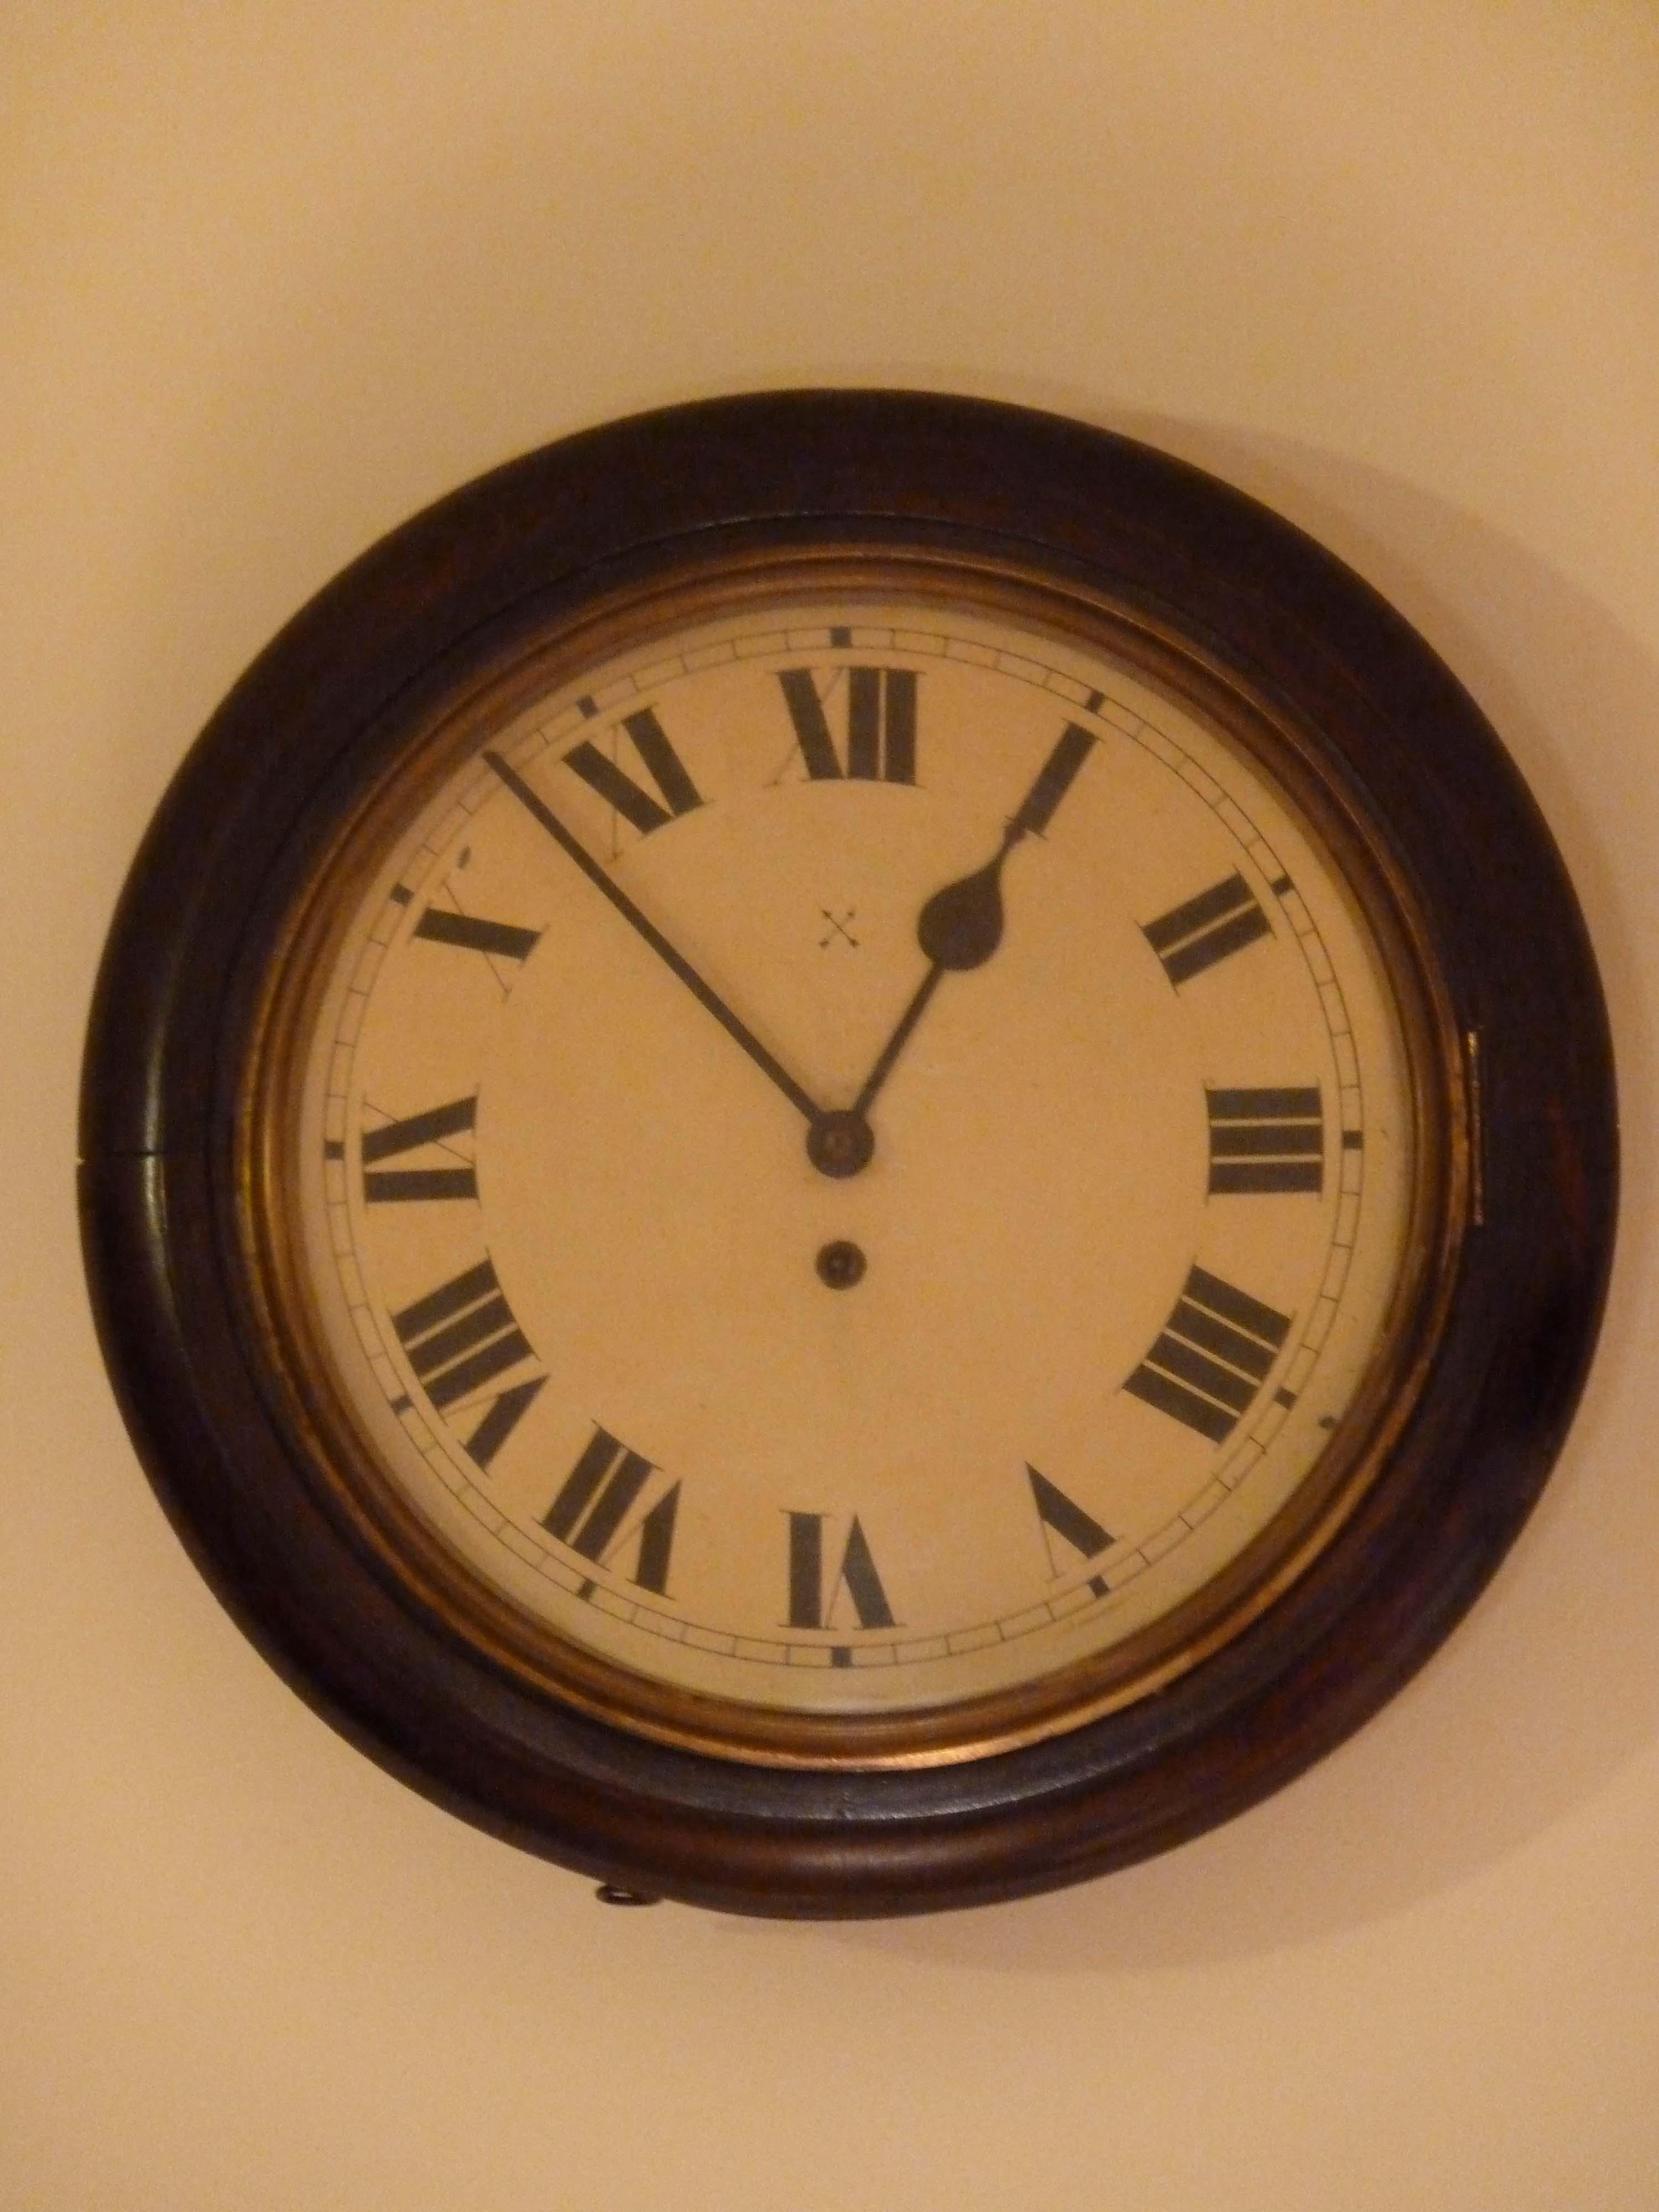 Antique Wall Clock School Clock Dial Clock Old Clocks Essex